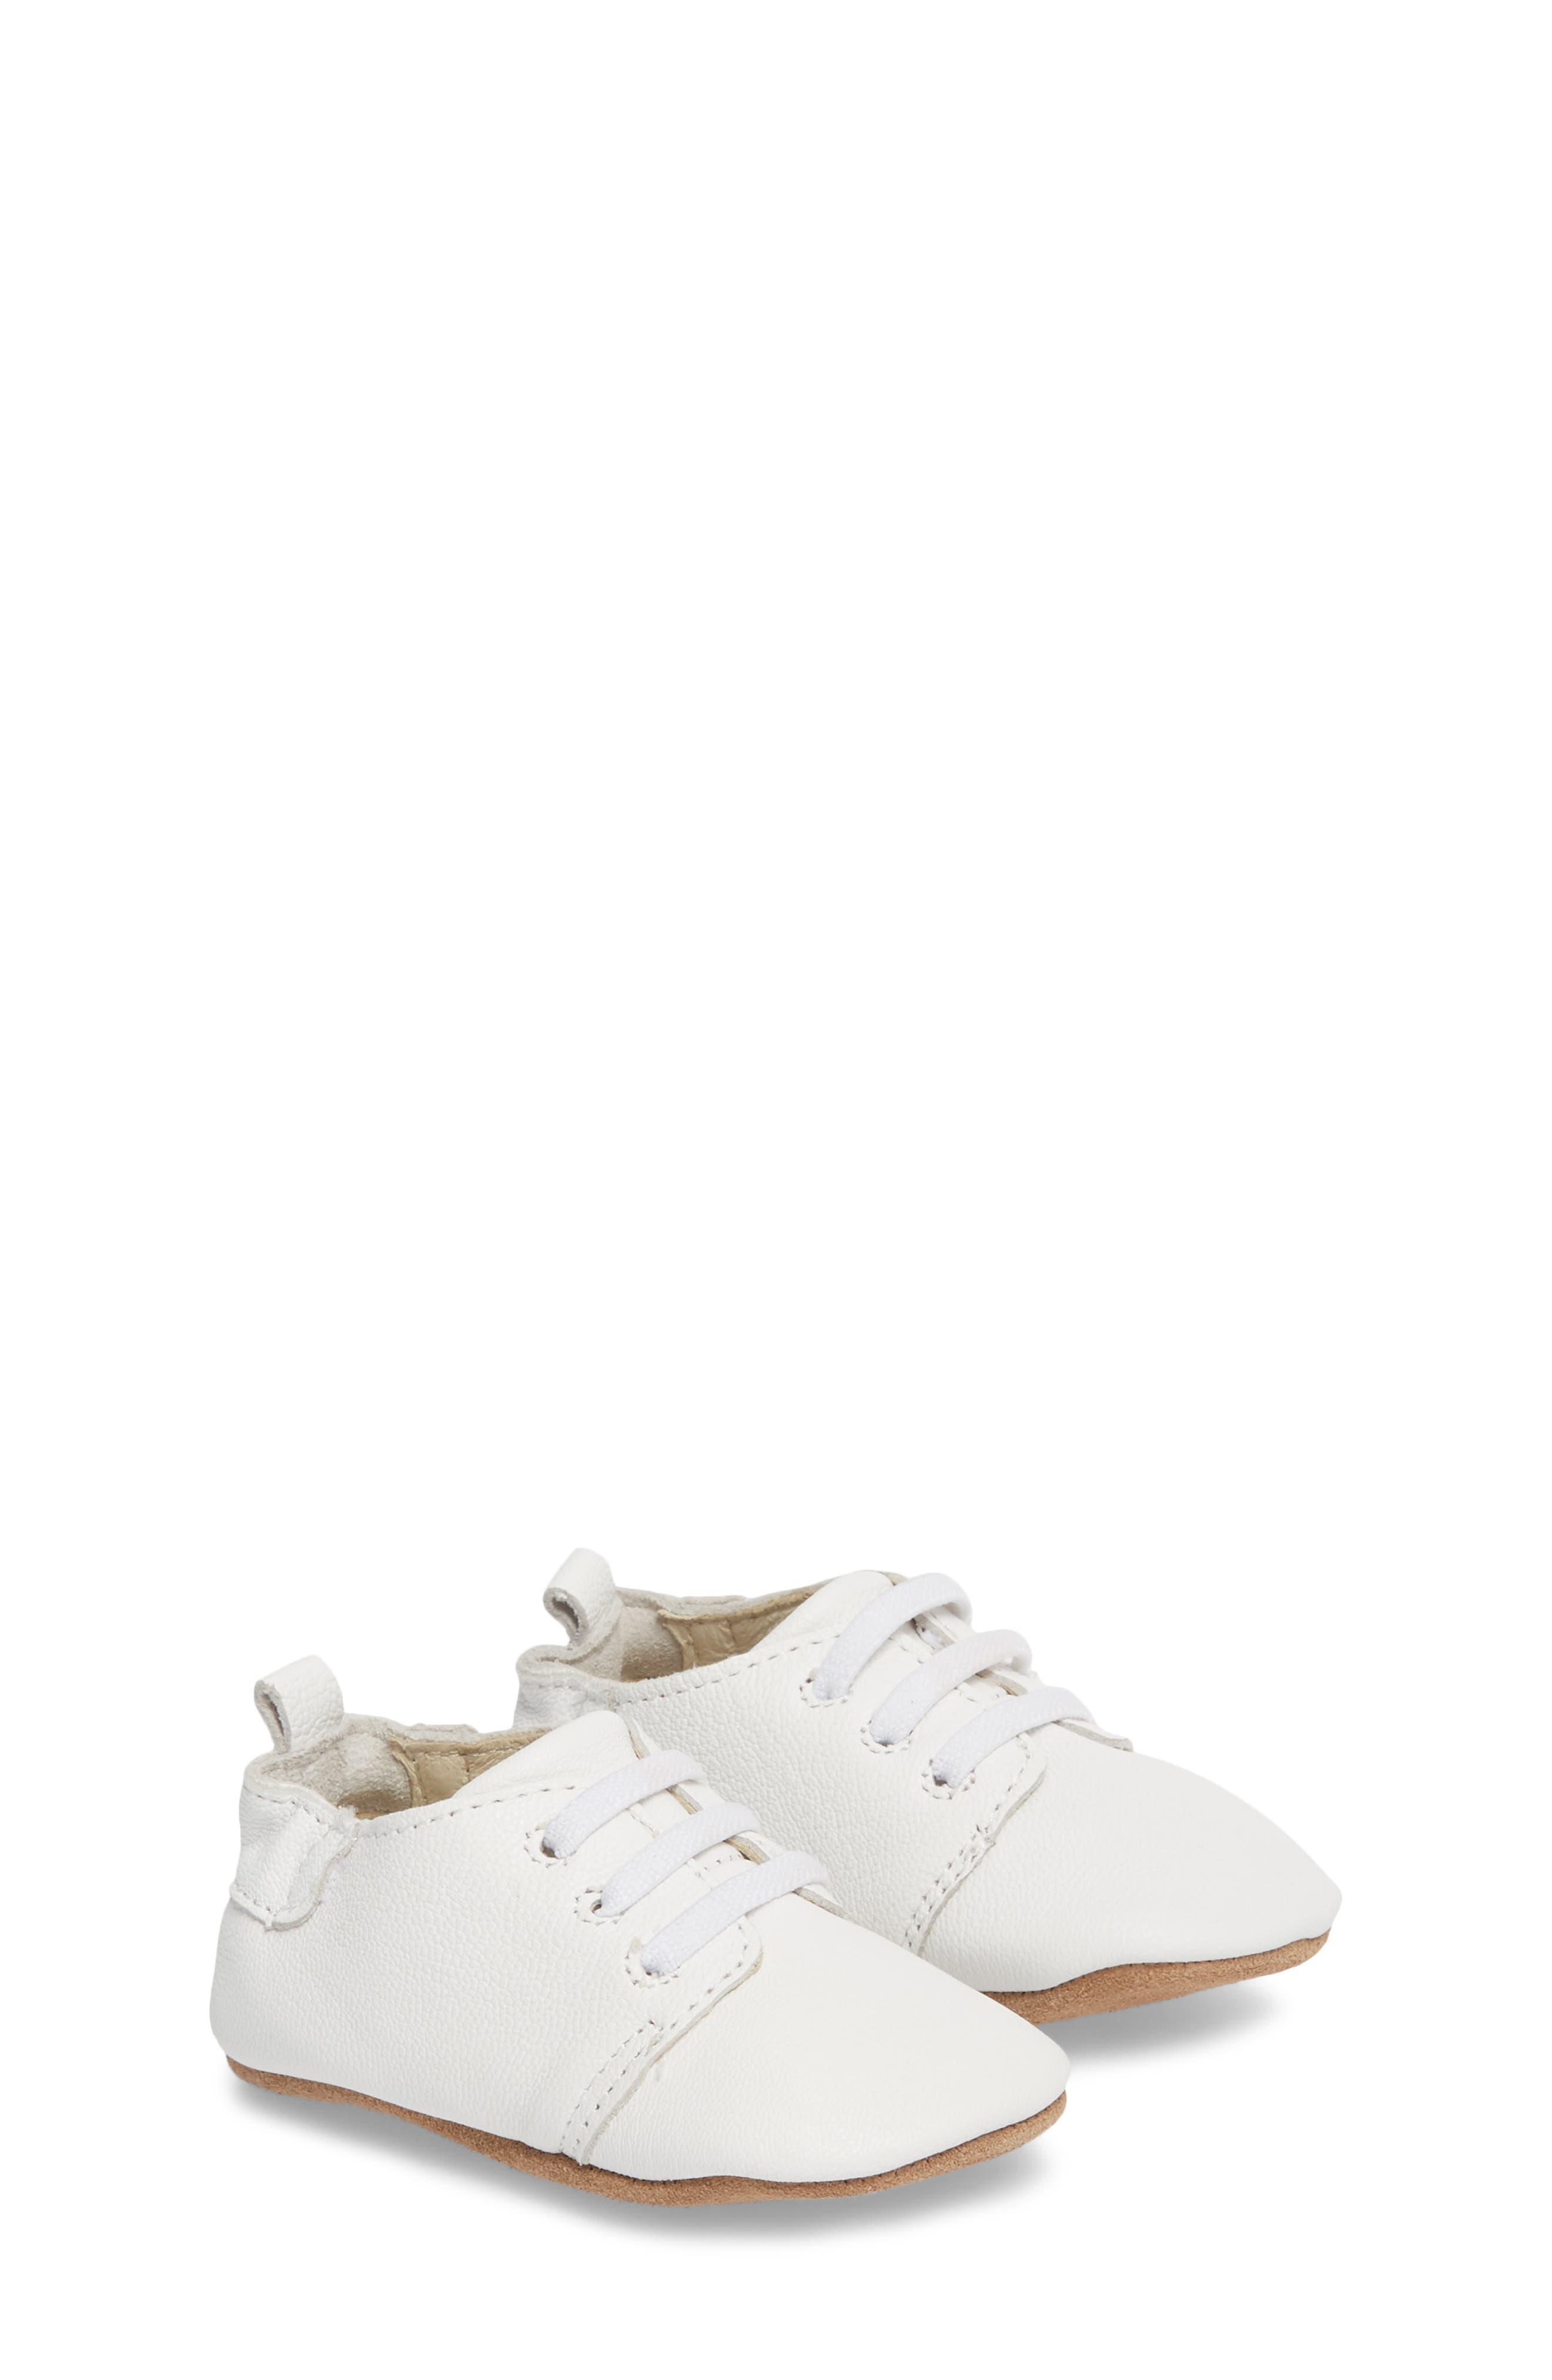 ROBEEZ<SUP>®</SUP>, Owen Oxford Crib Shoe, Main thumbnail 1, color, WHITE